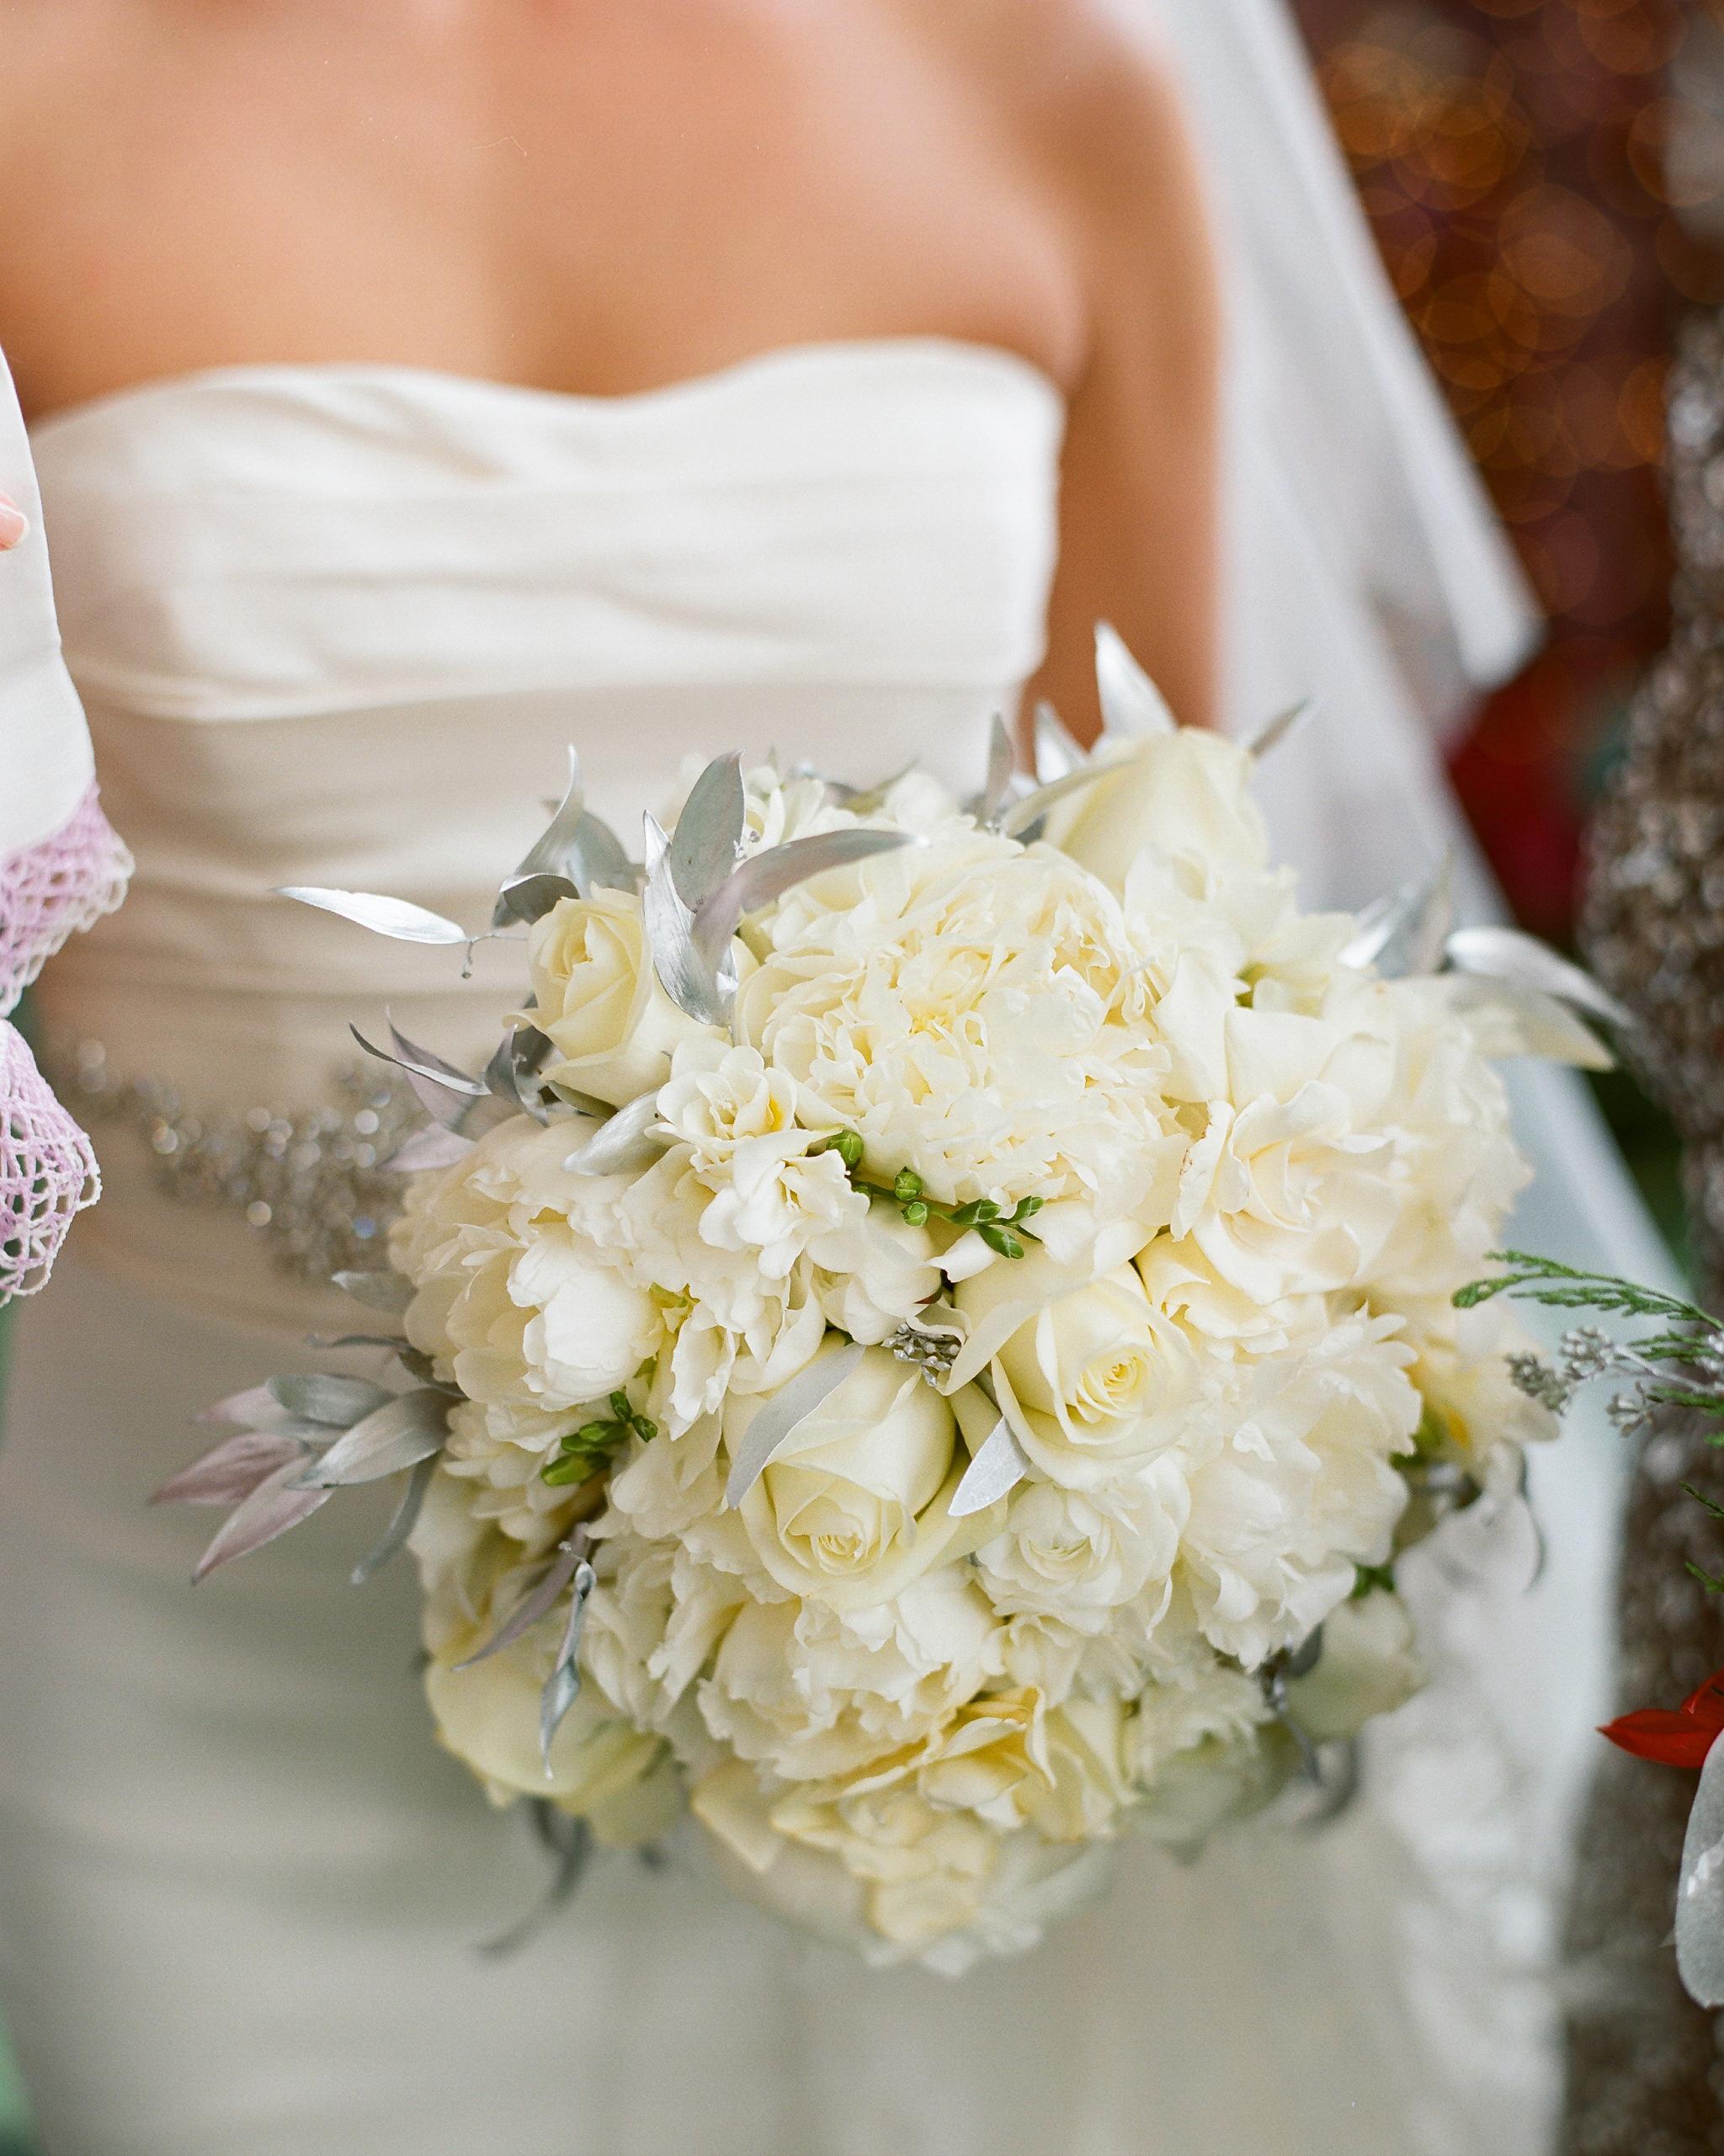 paige-michael-wedding-bouquet-0489-s112431-1215.jpg